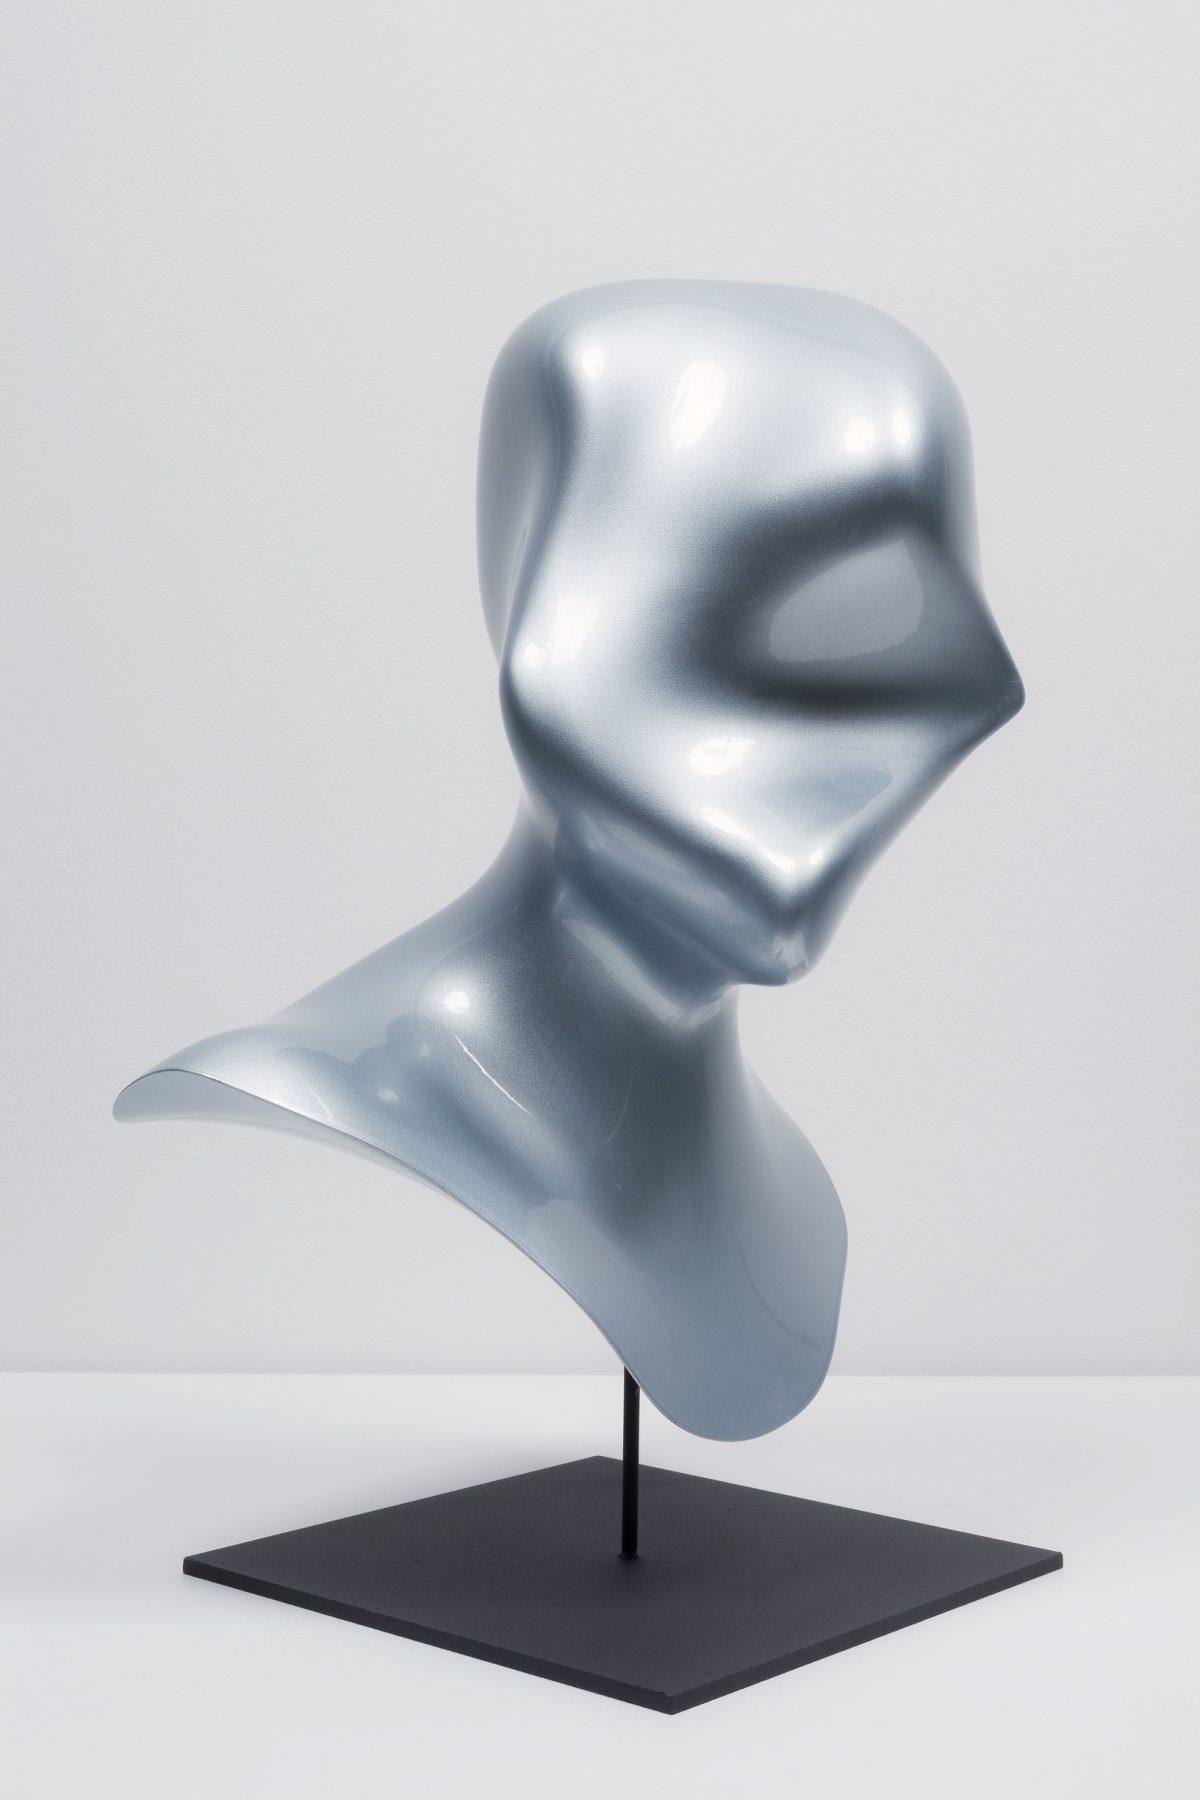 New Age Demanded (Pushed and Pulled), 2014, Jon Rafman, Résine photopolymère 3D et peinture.